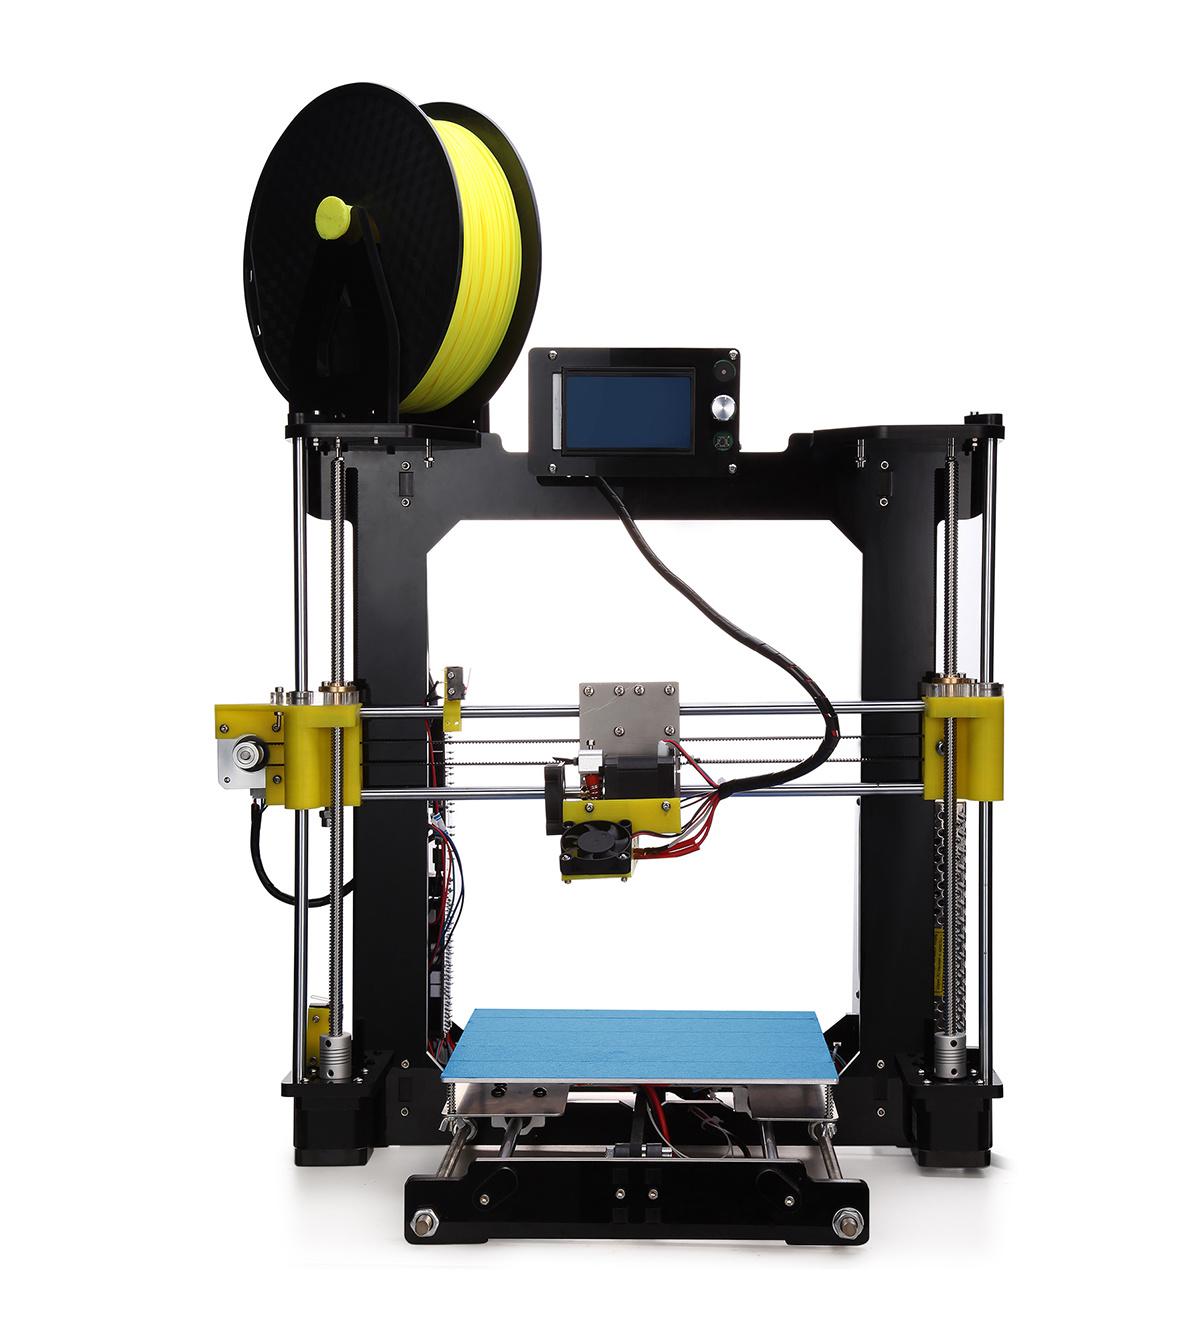 2017 Acrylic Rapid Prototype Desktop DIY Fdm 3D Printer Machine